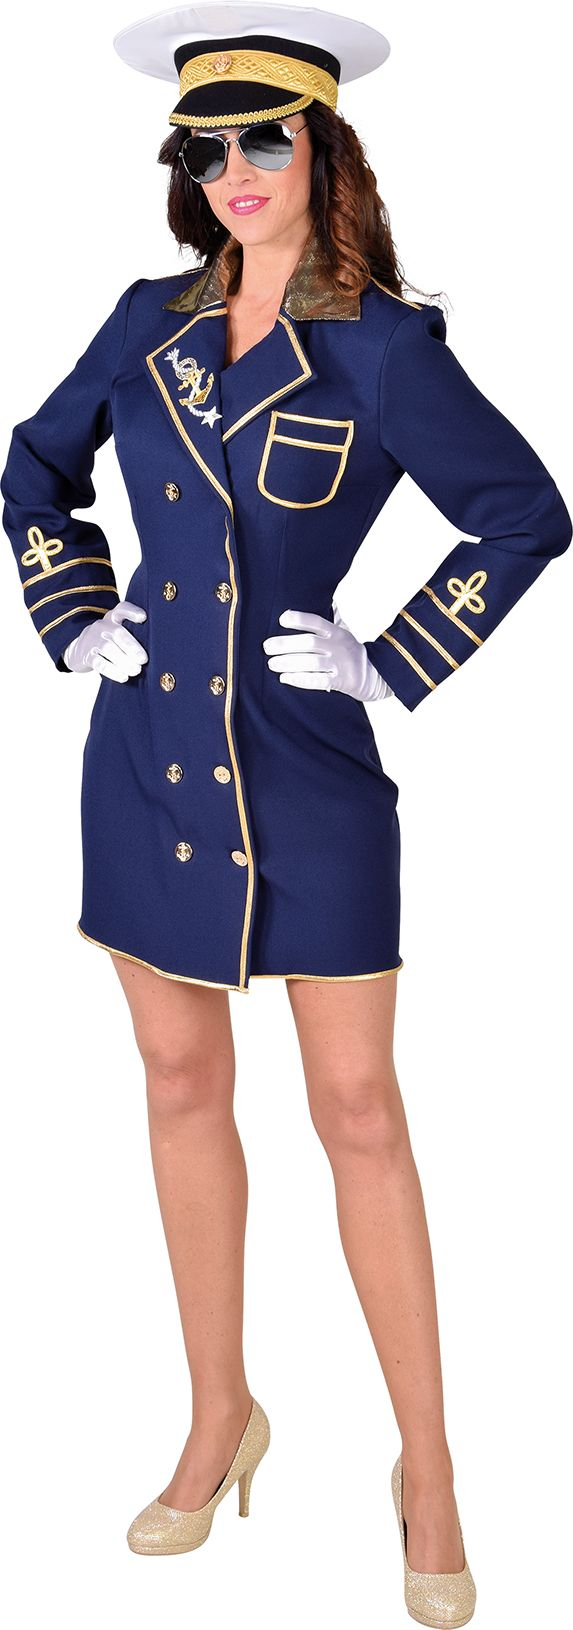 Blauw kapiteinsjurkje vrouwen